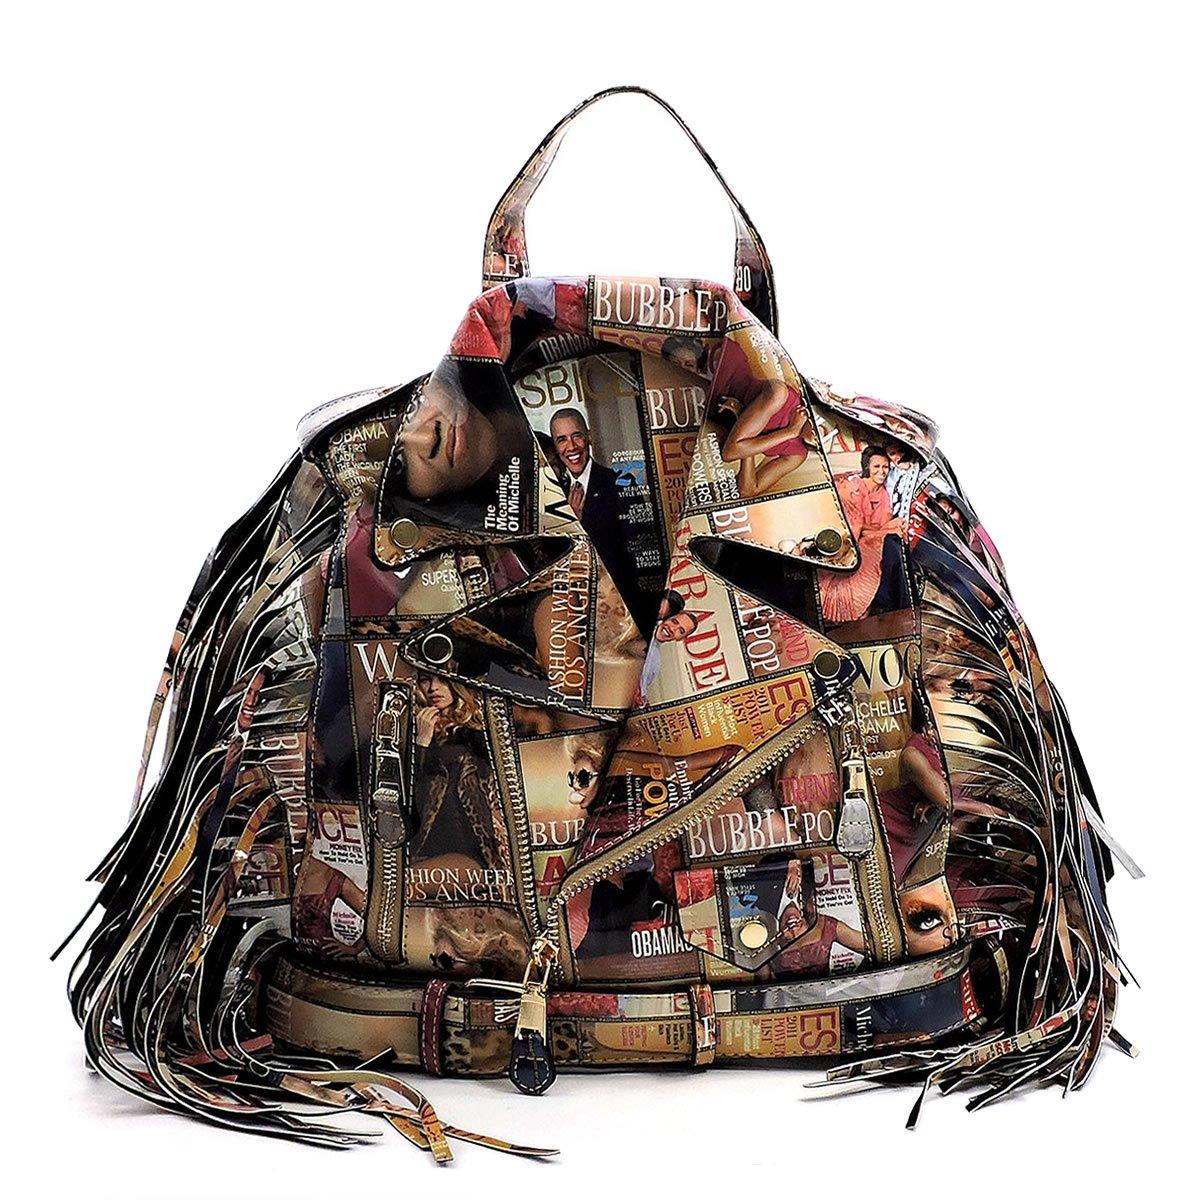 Glossy Magazine Cover Collage Motorcycle Jacket Fringe Backpack Michelle Obama Handbag (Multi) by Elphis